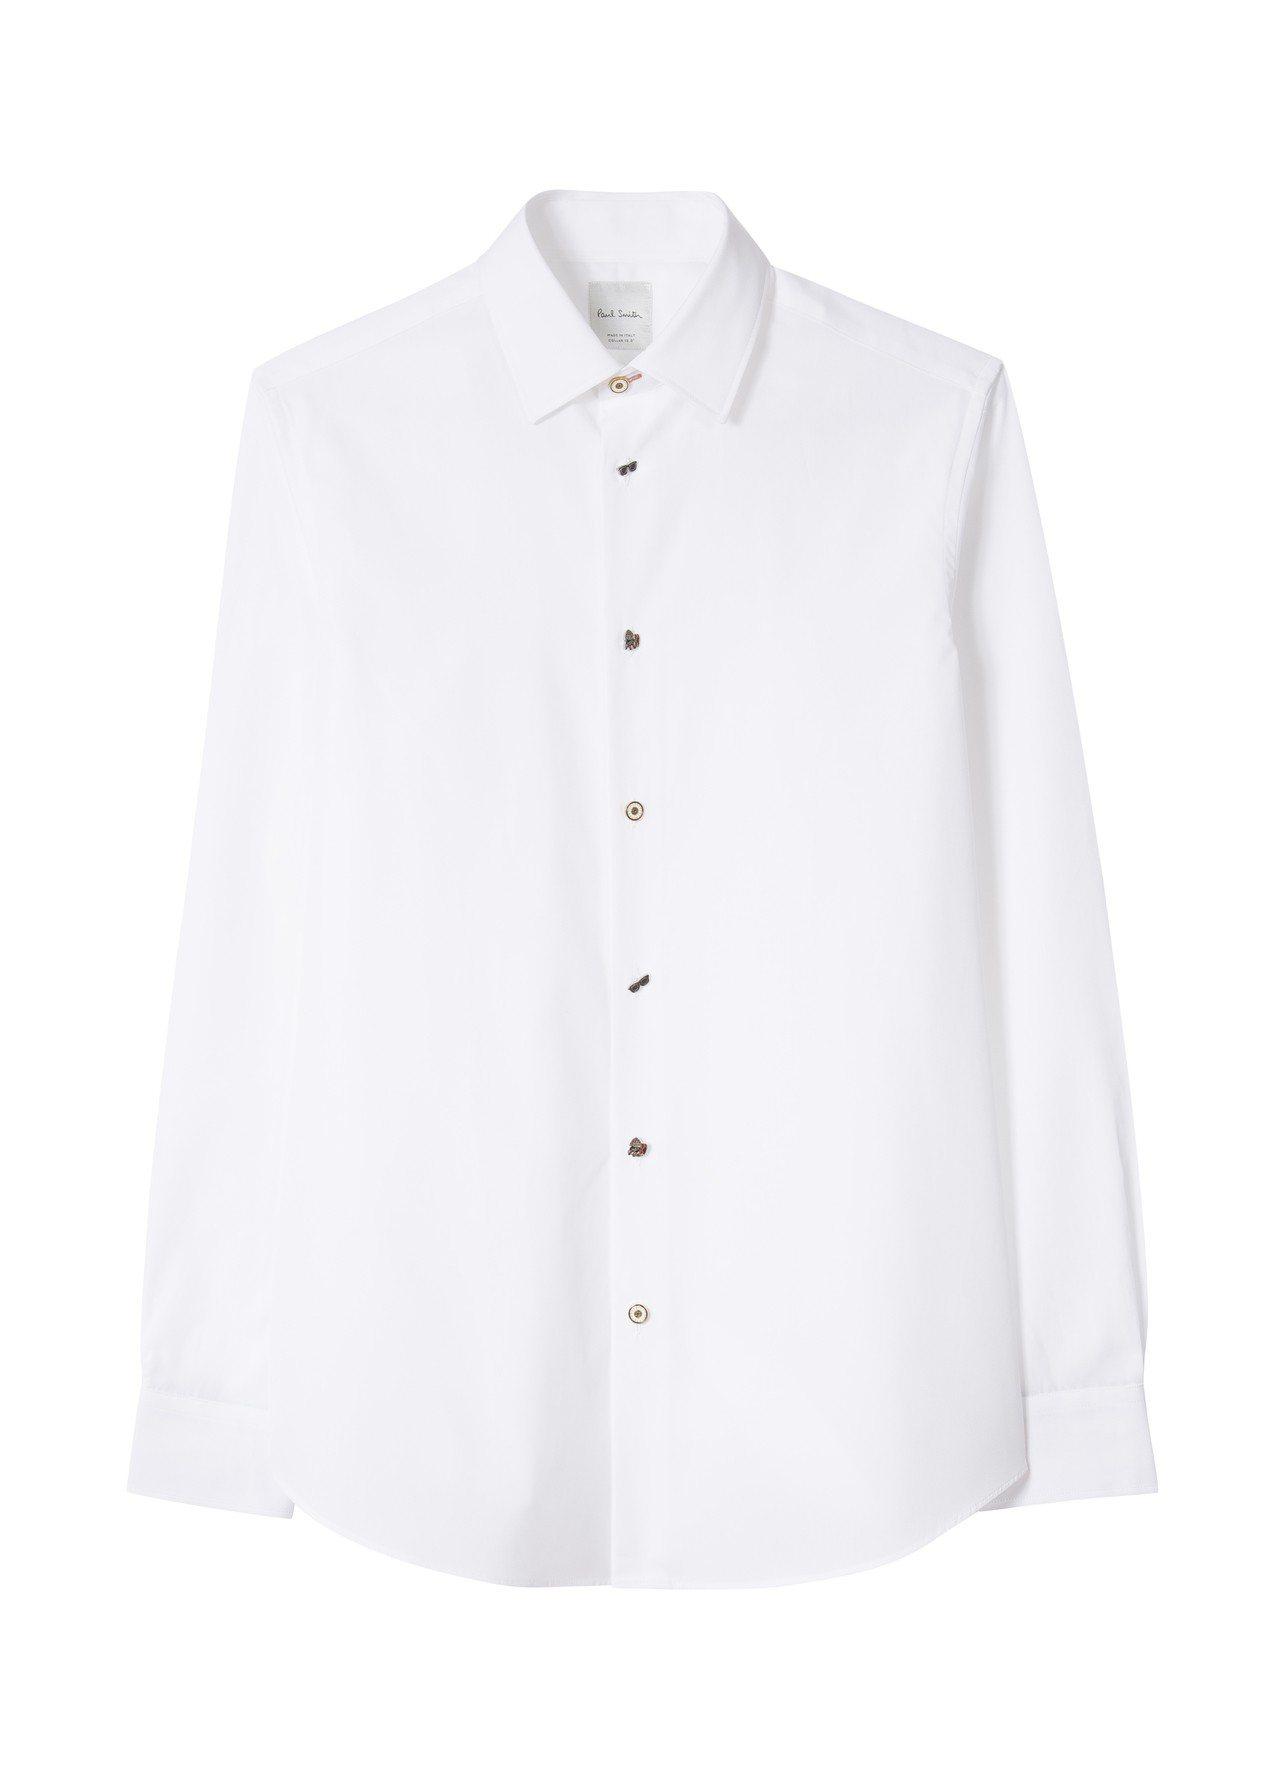 《MIB星際戰警™:跨國行動》限量膠囊系列MIB造型鈕釦白色襯衫,16,300元...